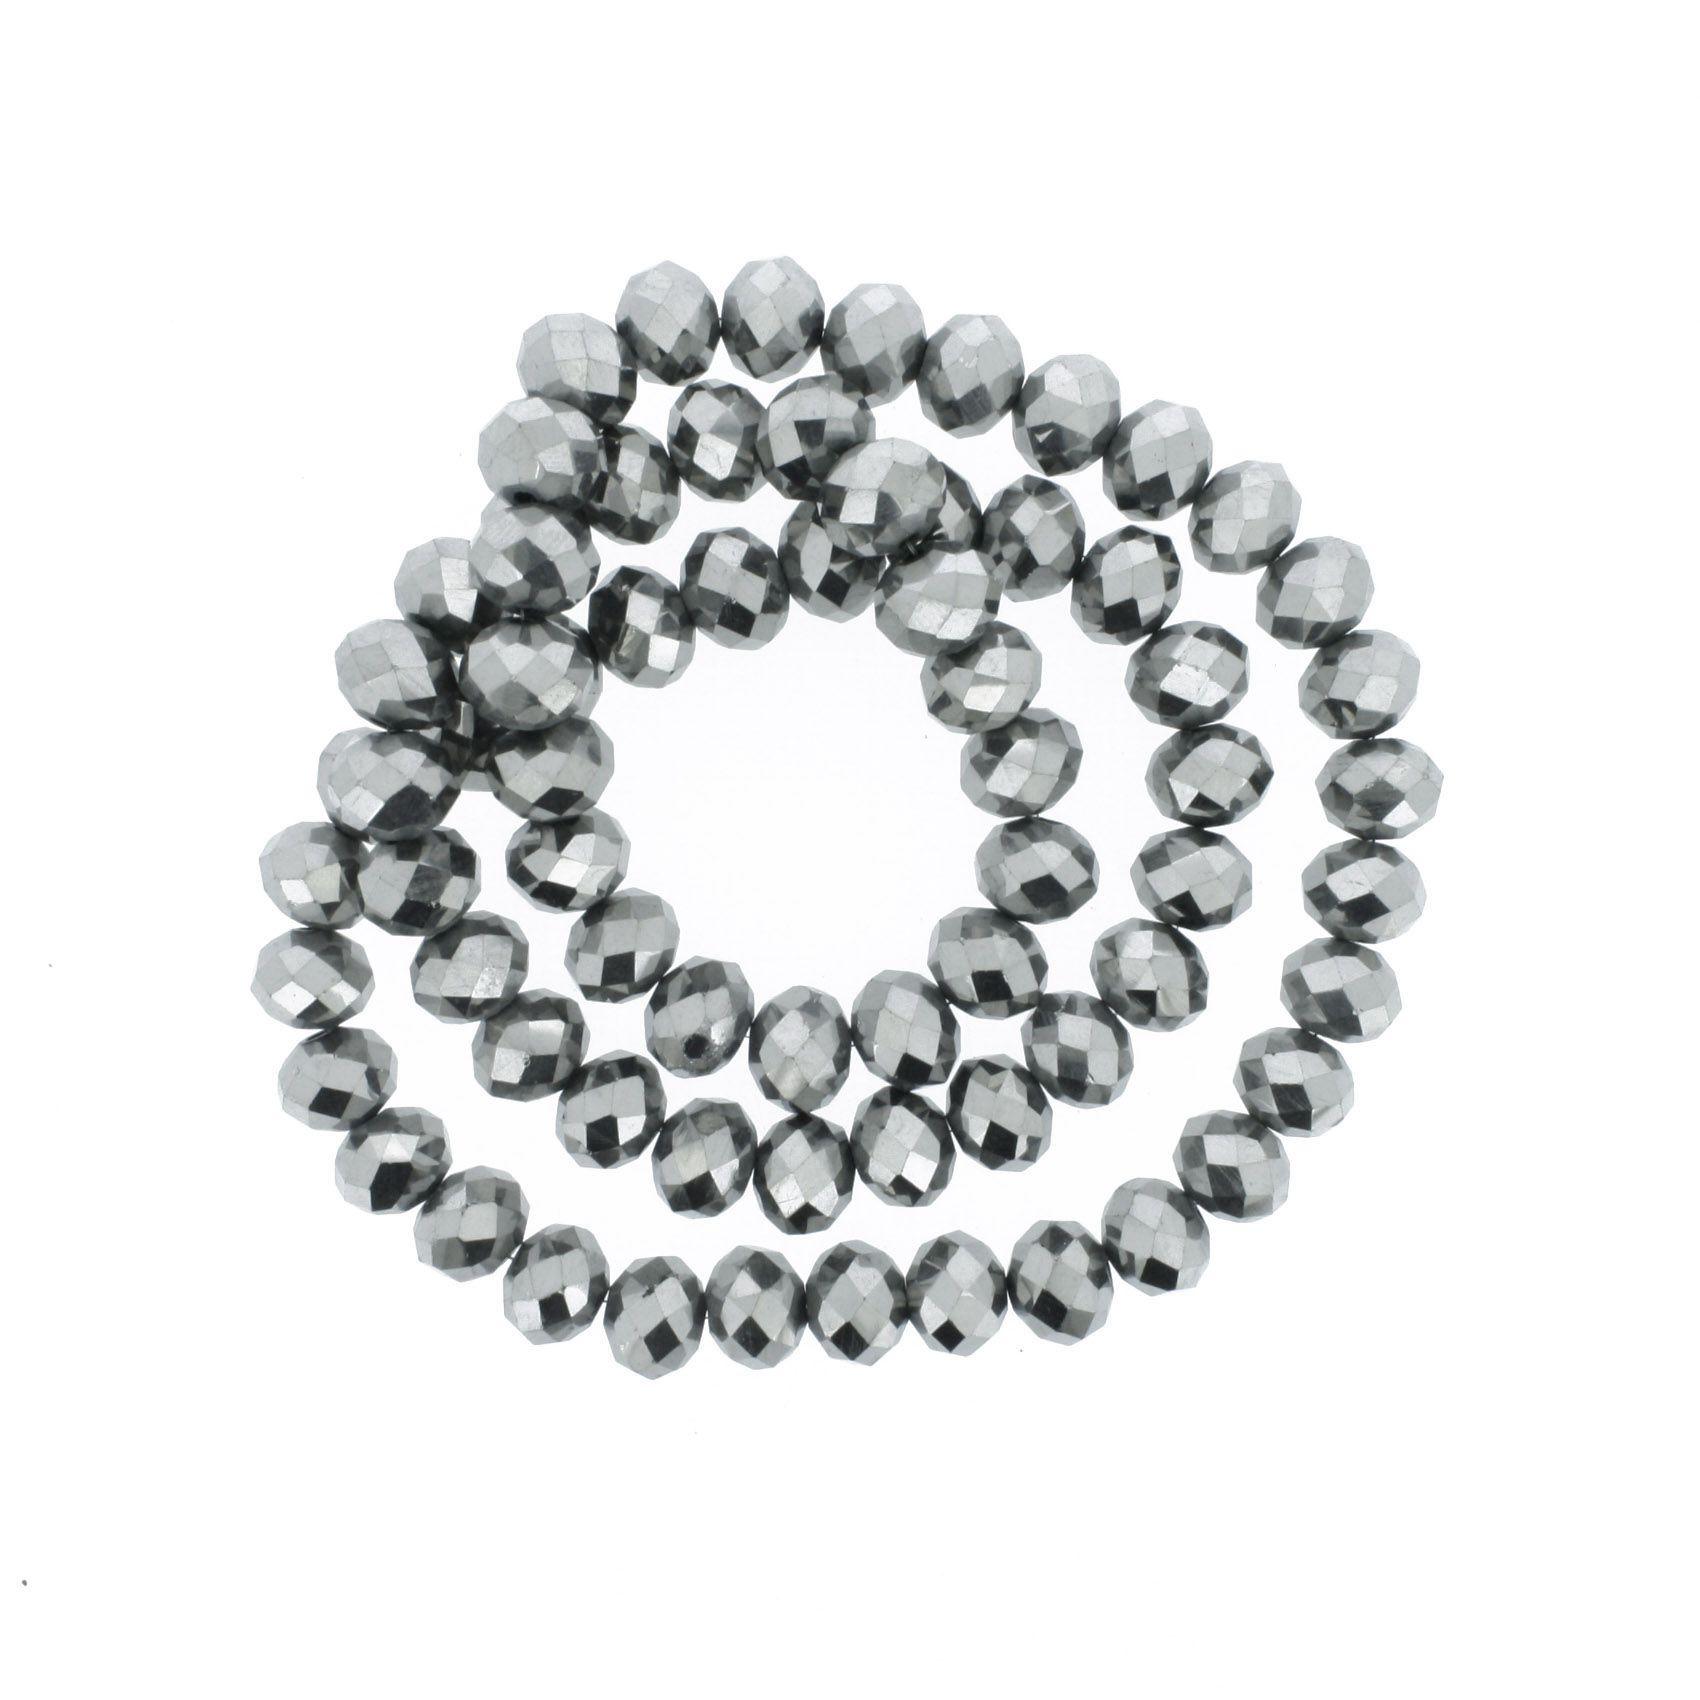 Fio de Cristal - Flat® - Prateado - 10mm  - Stéphanie Bijoux® - Peças para Bijuterias e Artesanato